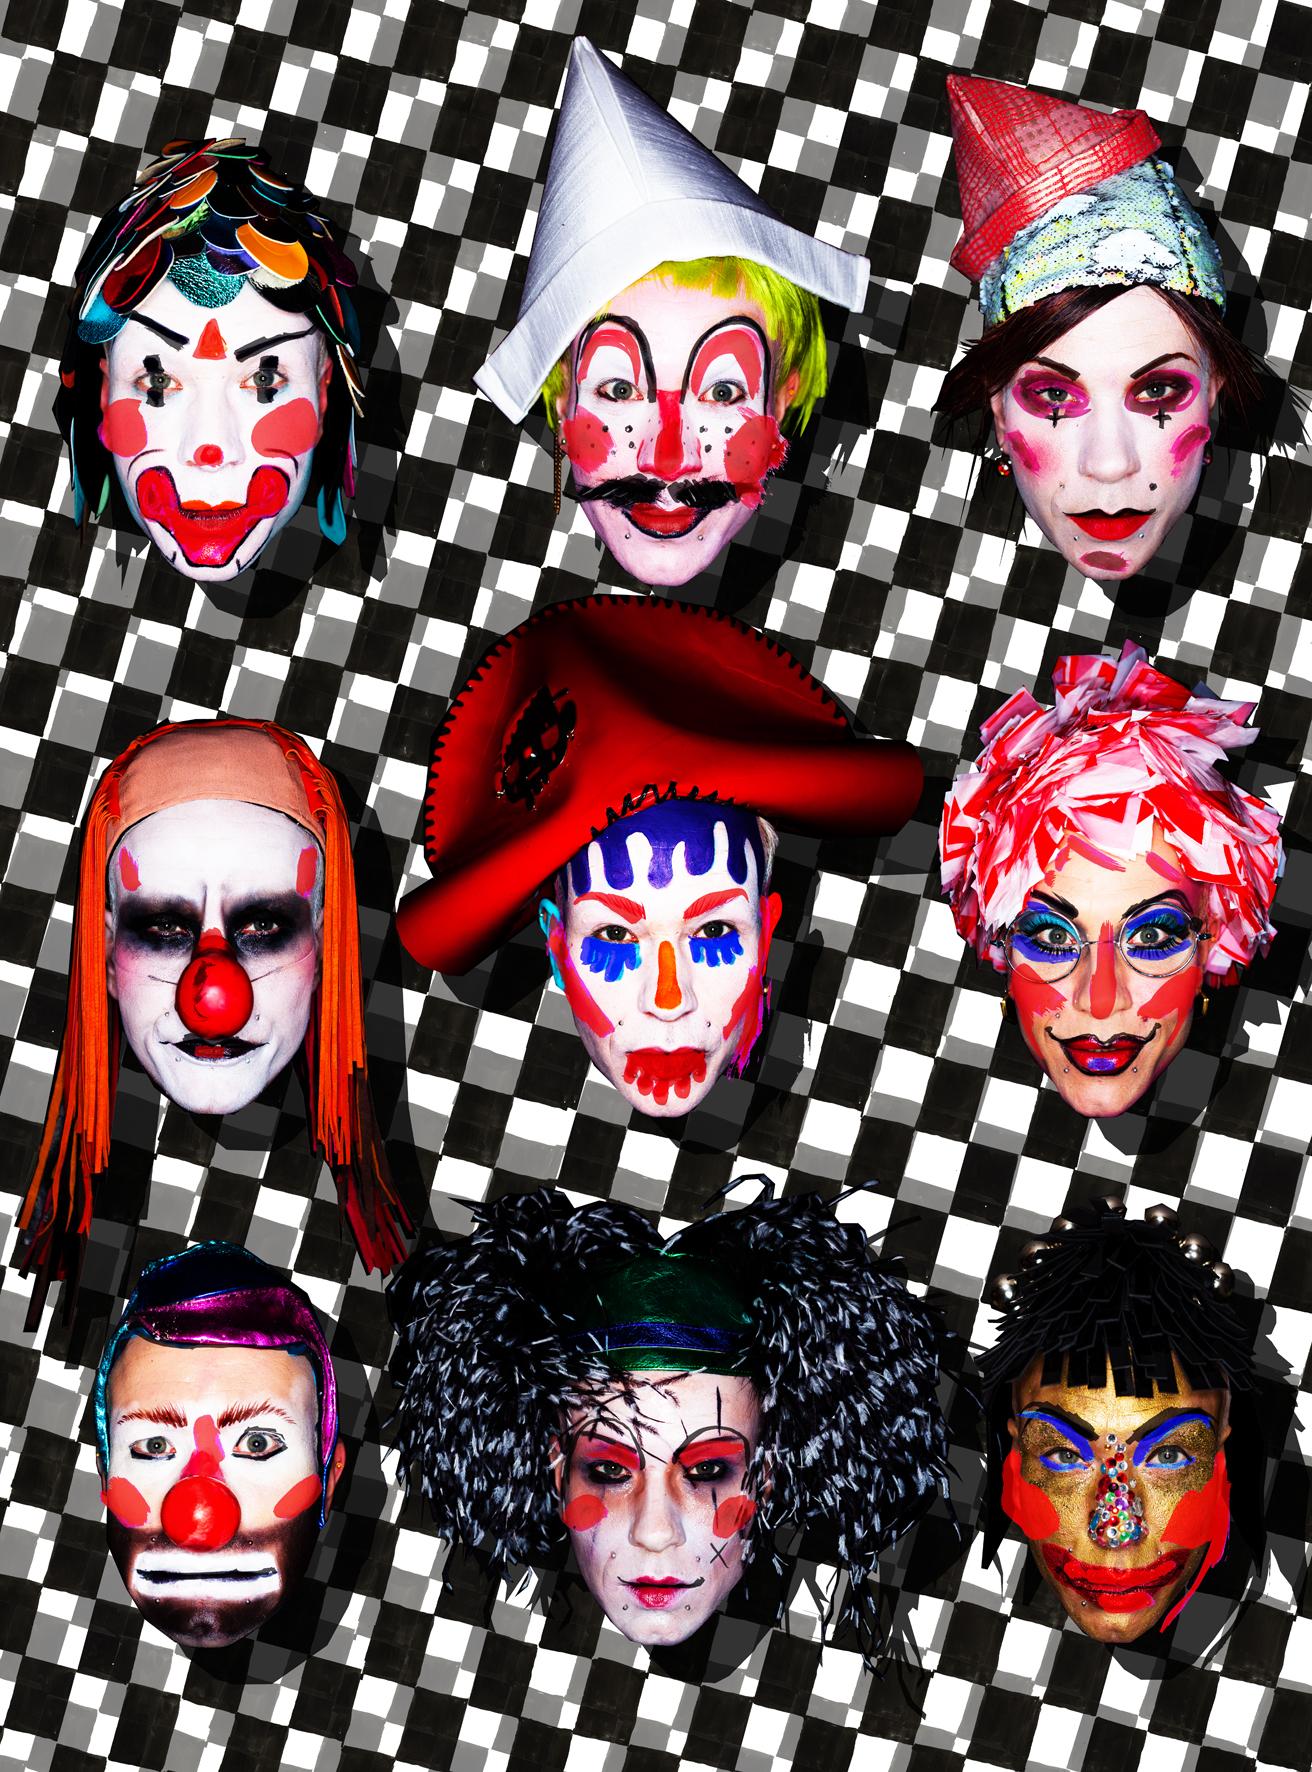 bas-kosters-clown-print-grungecake-thumbnail